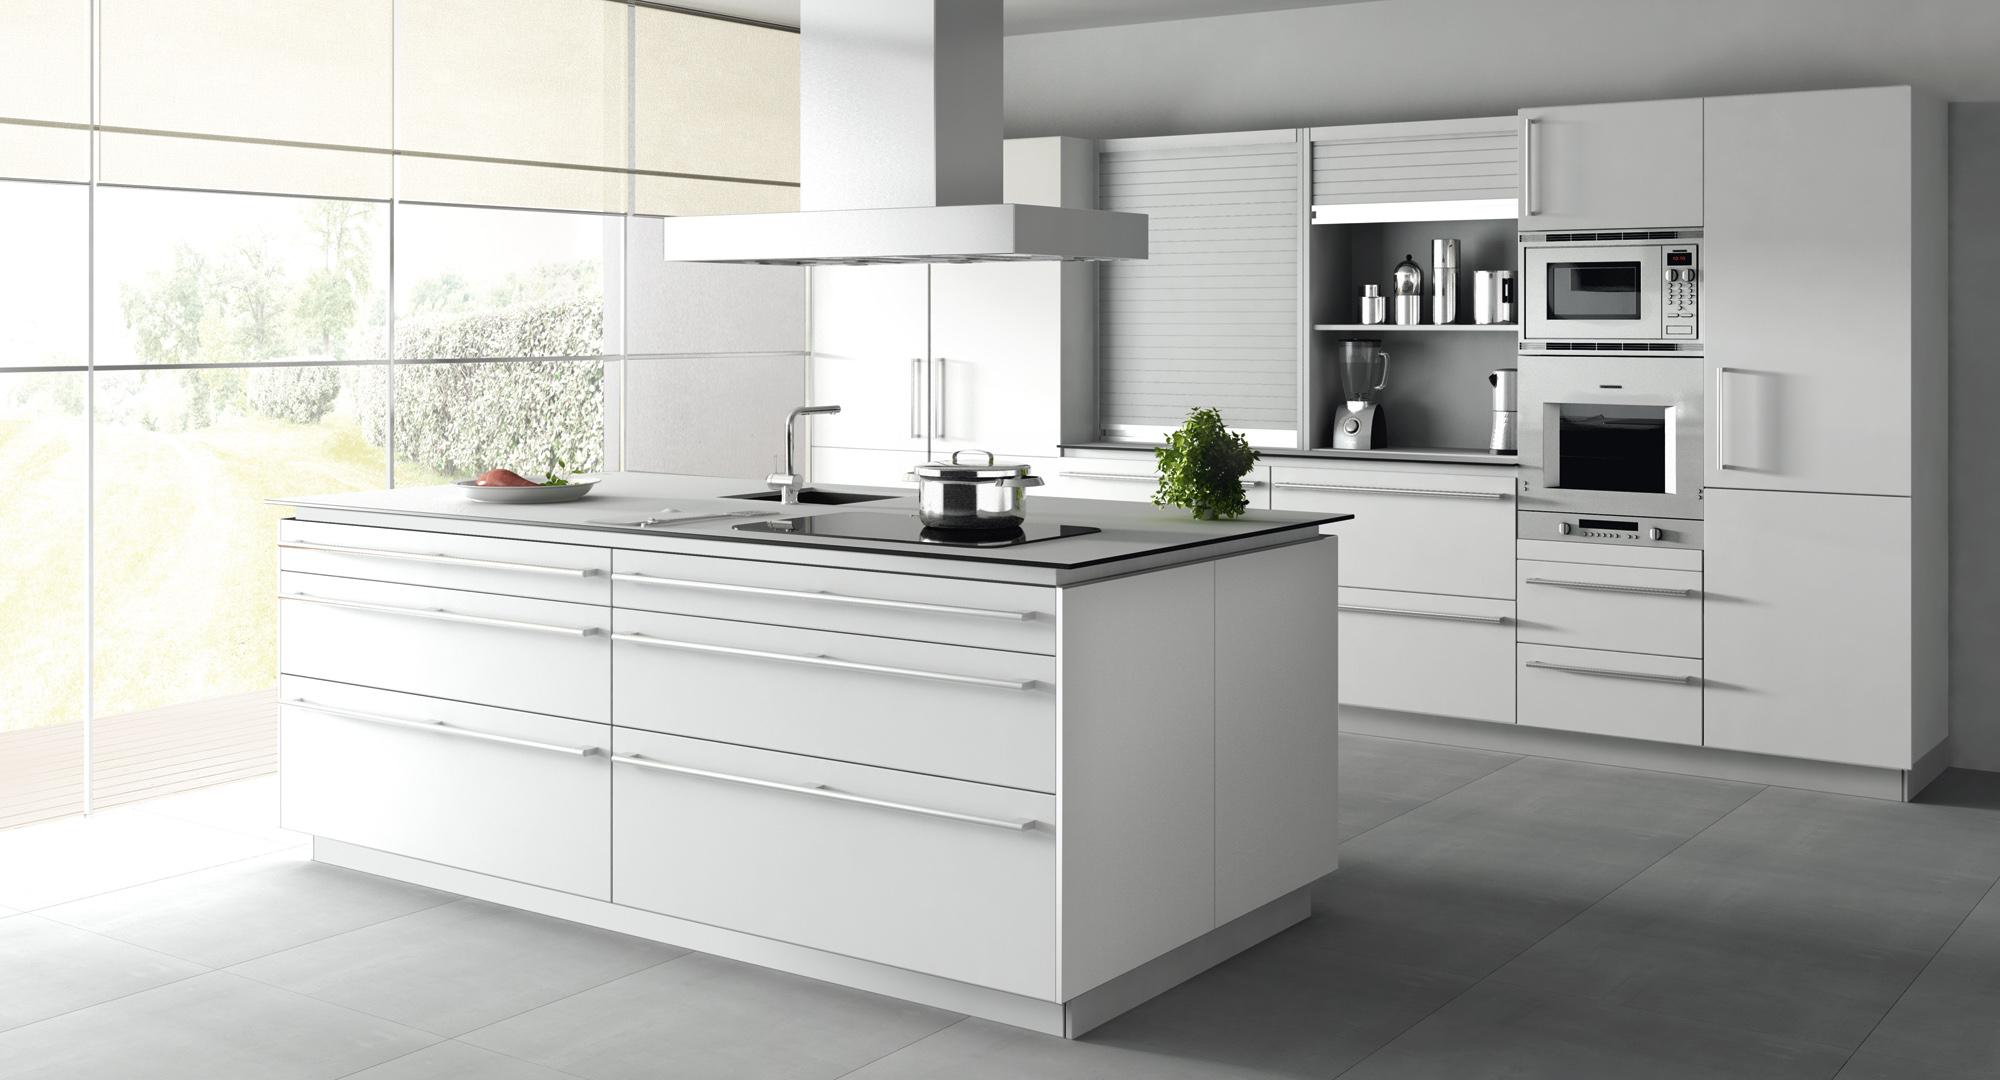 Softimage xsi realistic kitchen - Cocinas marbella ...